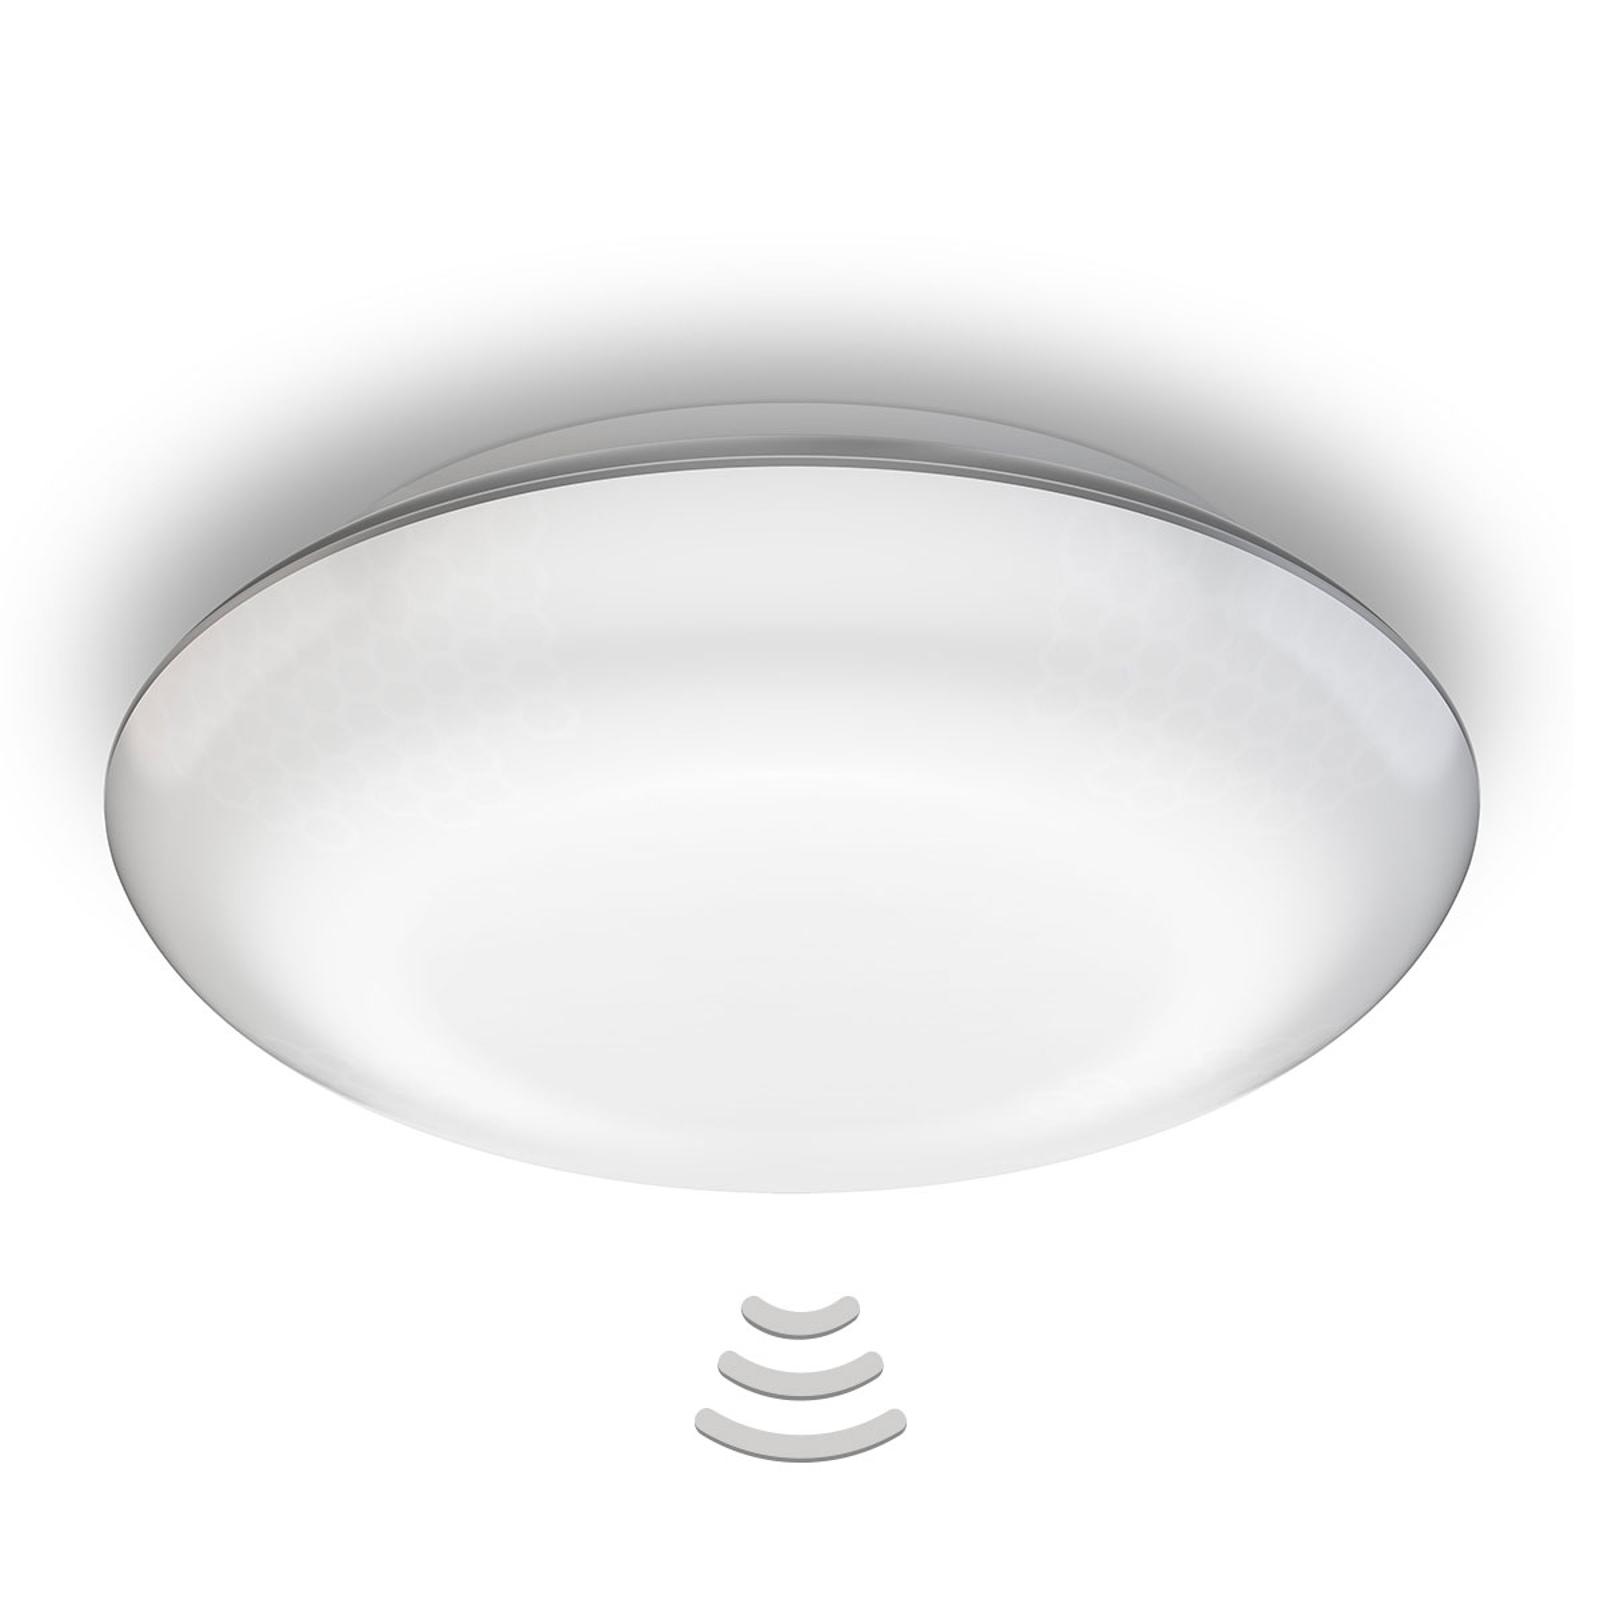 STEINEL DL Vario Quattro LED sensor ceiling light_8505747_1